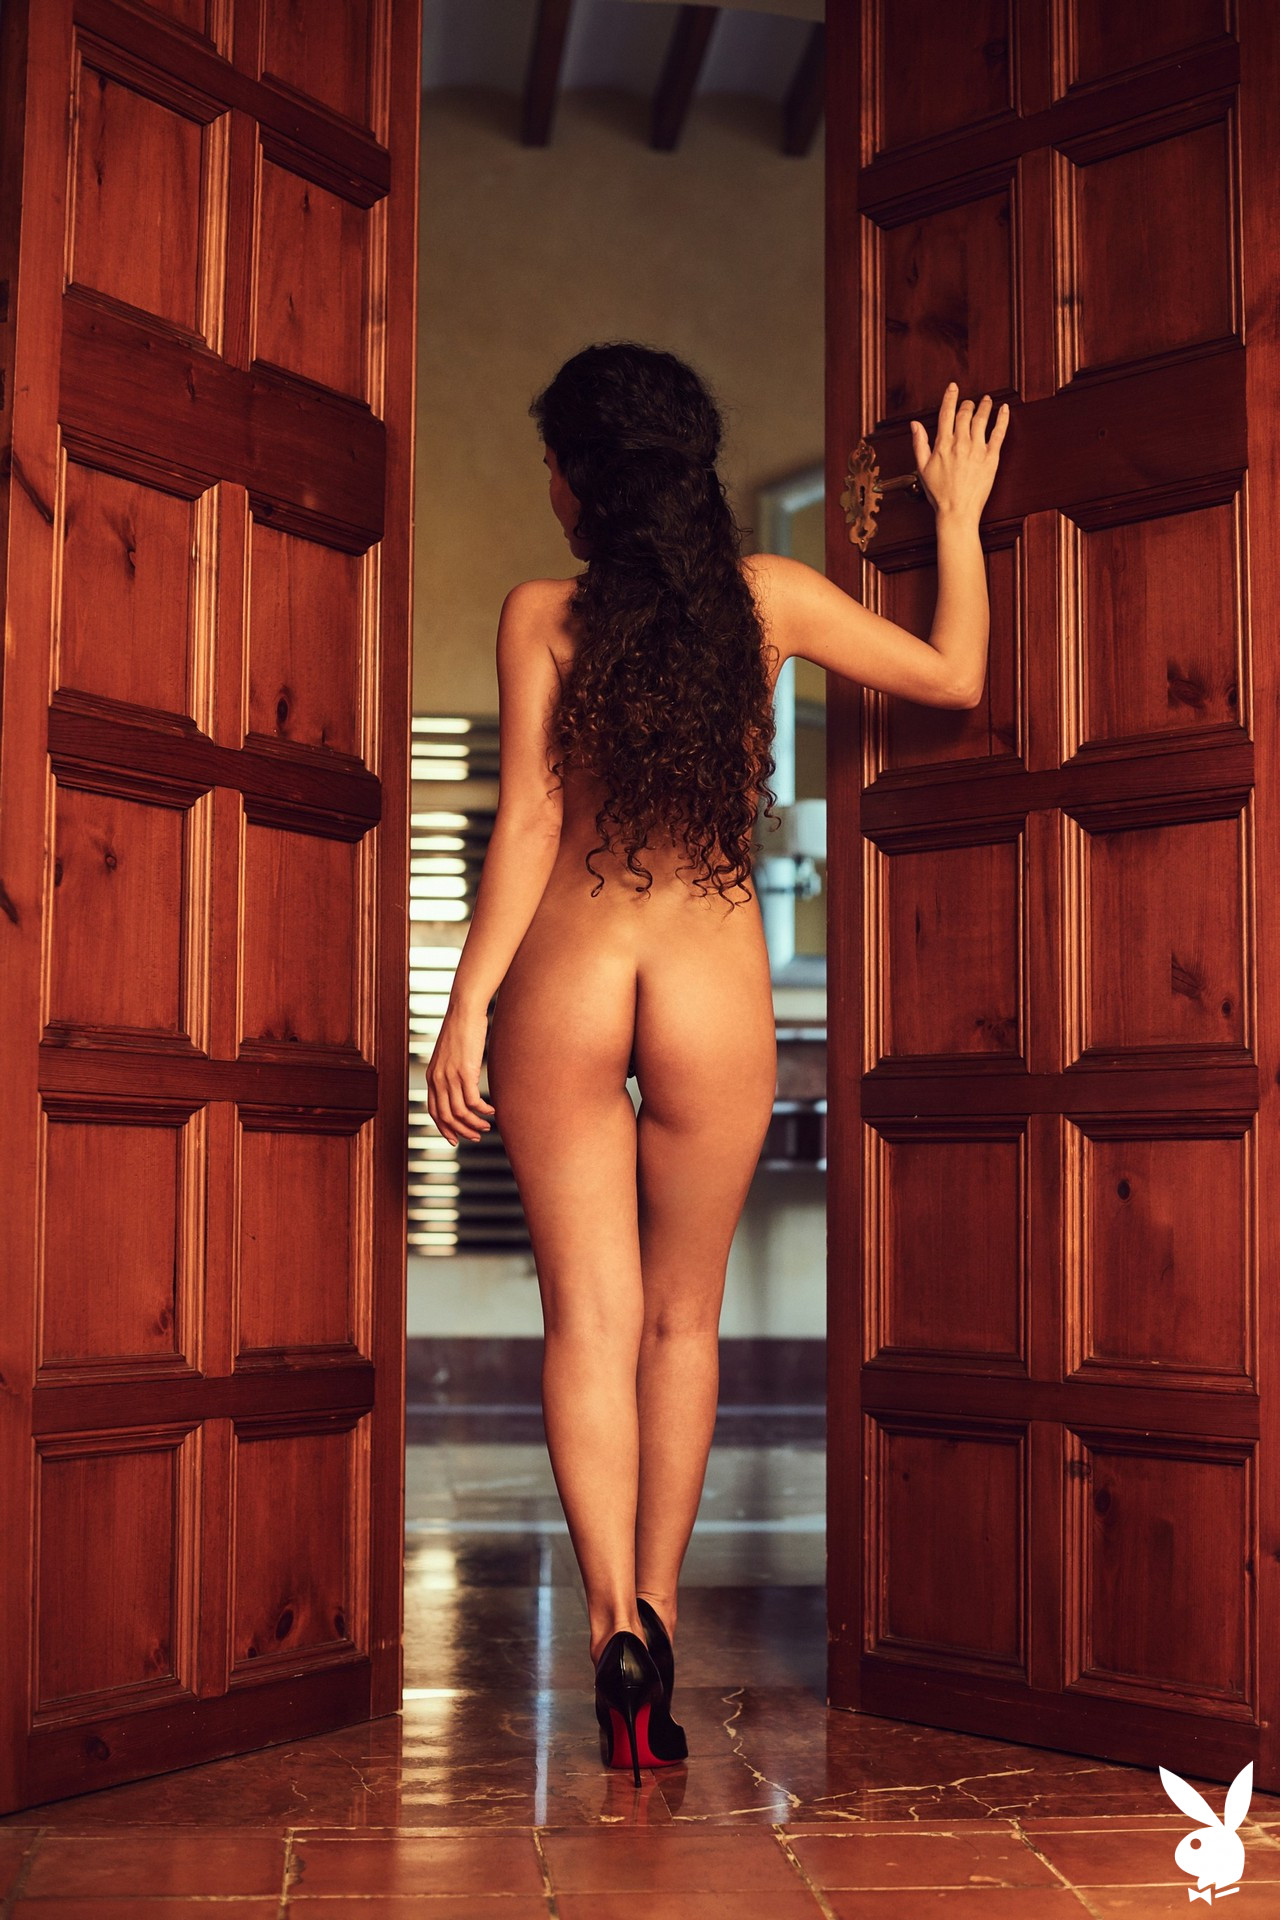 Bana Hamawandi In Playboy Germany Playboy Plus (30)